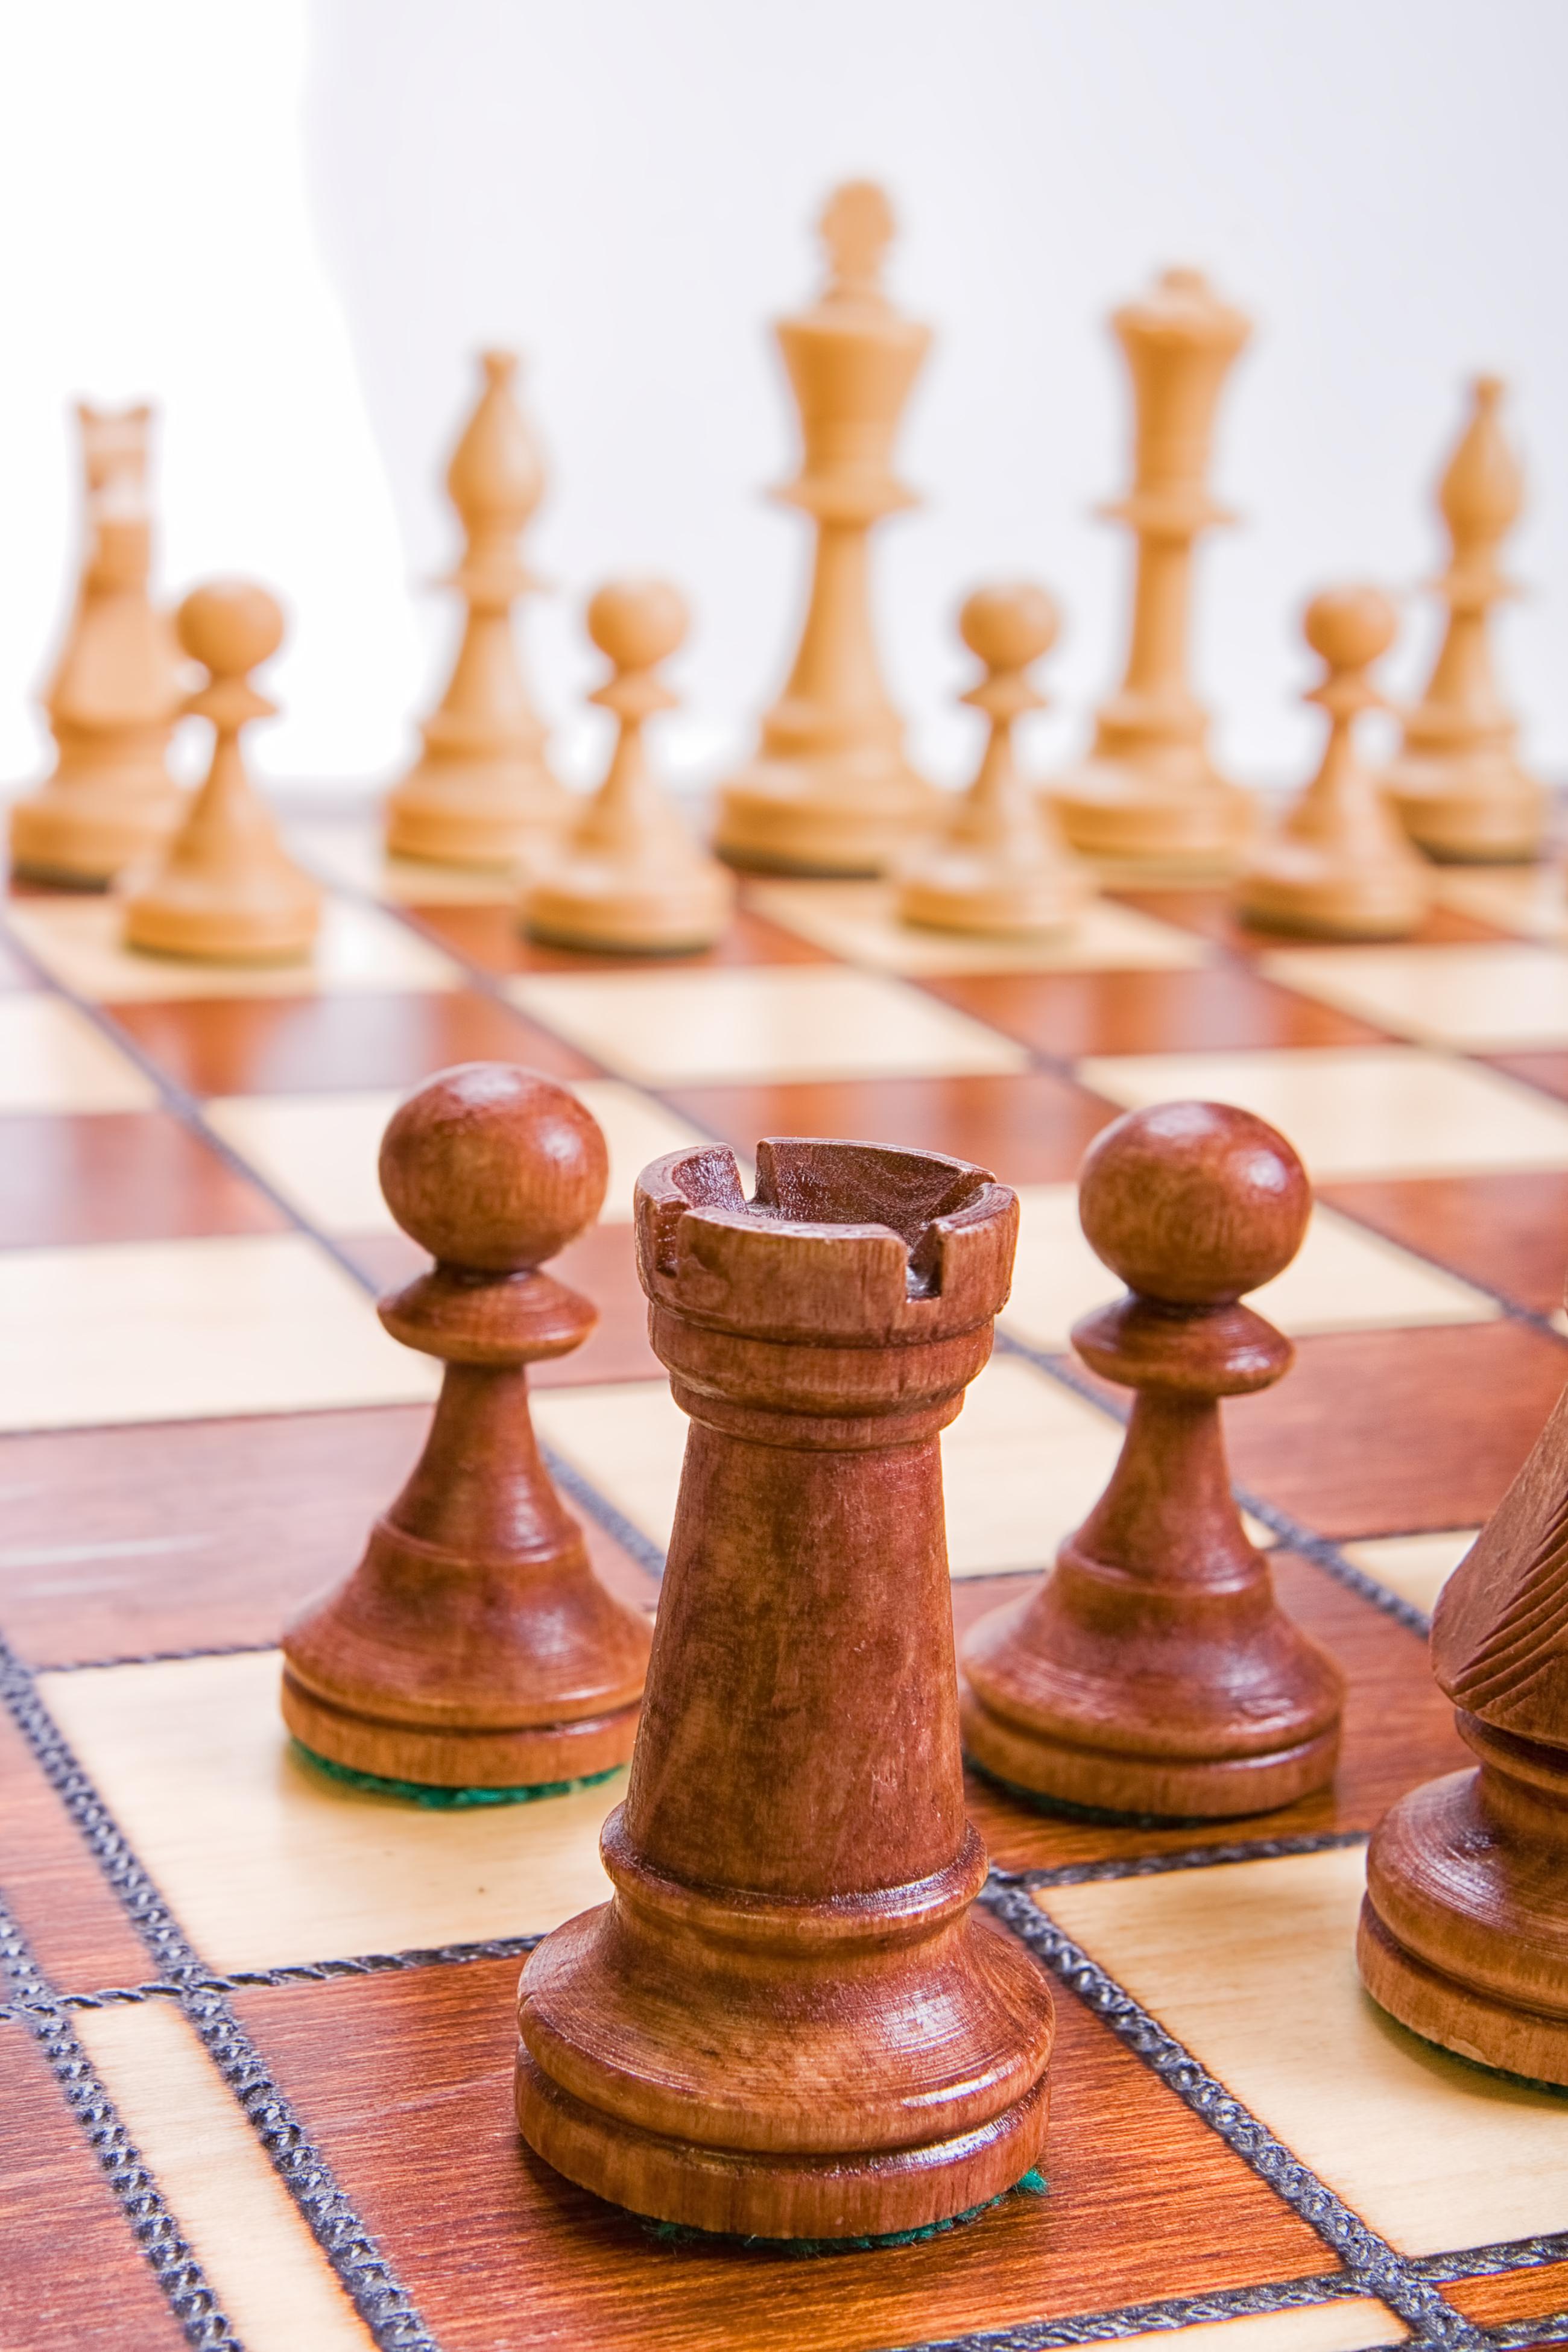 chess, Battle, Intelligence, Think, Success, HQ Photo